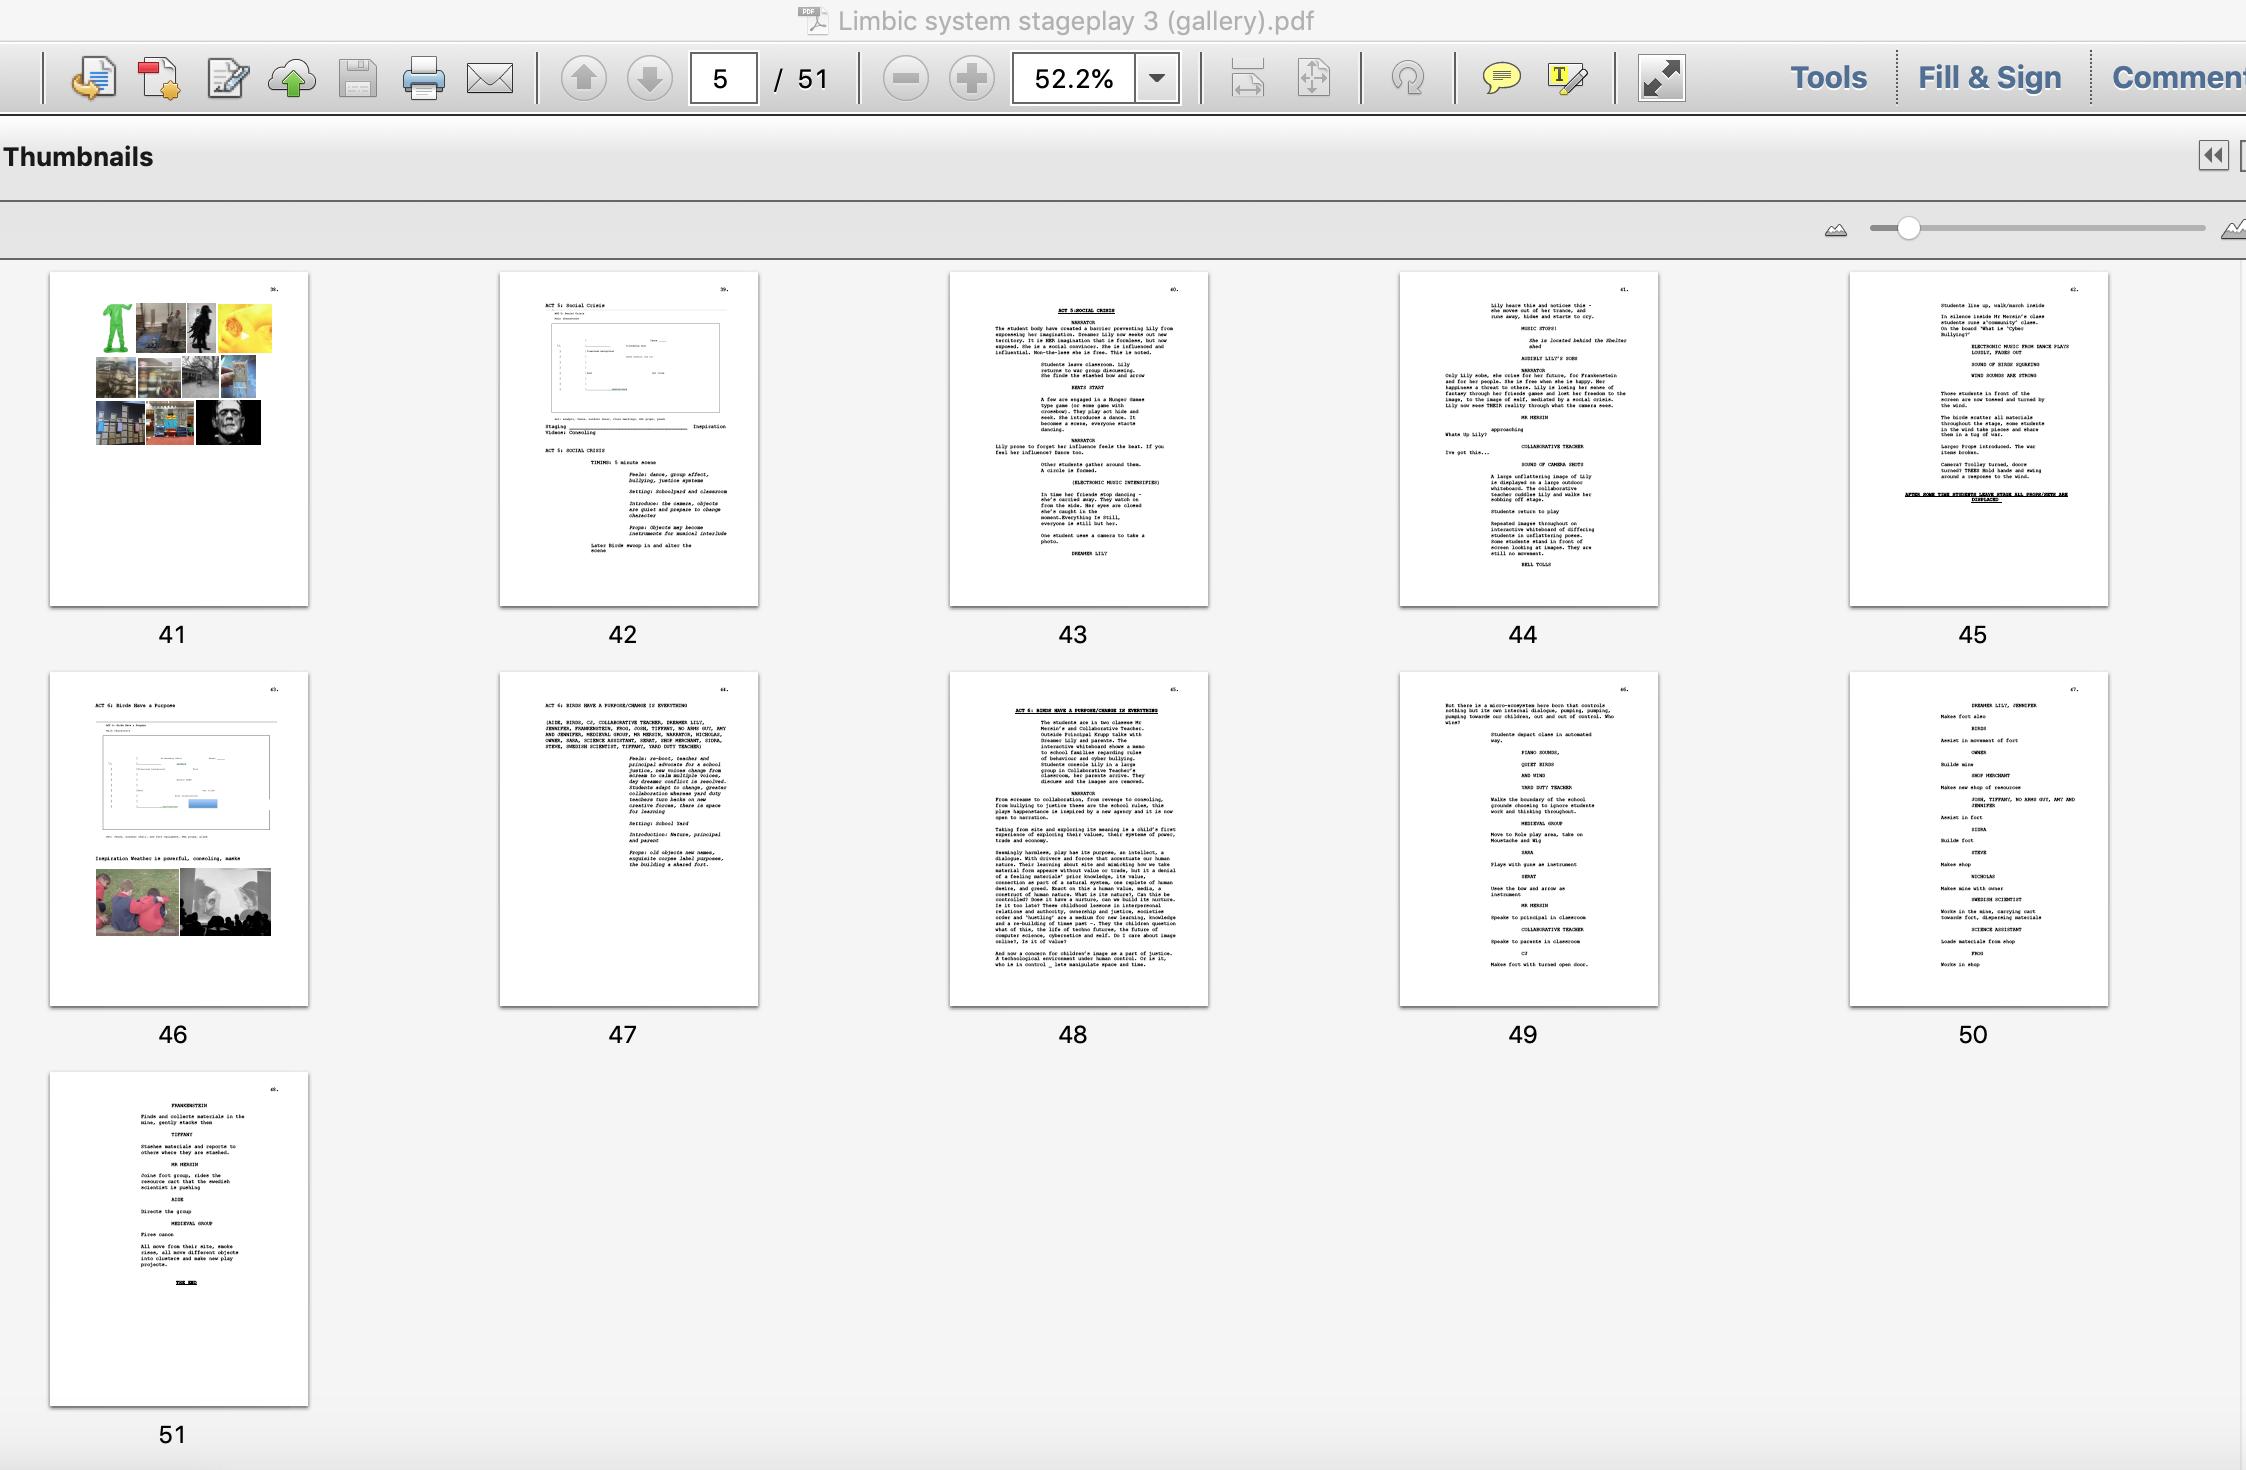 Script unprinted OALSETL 5.png